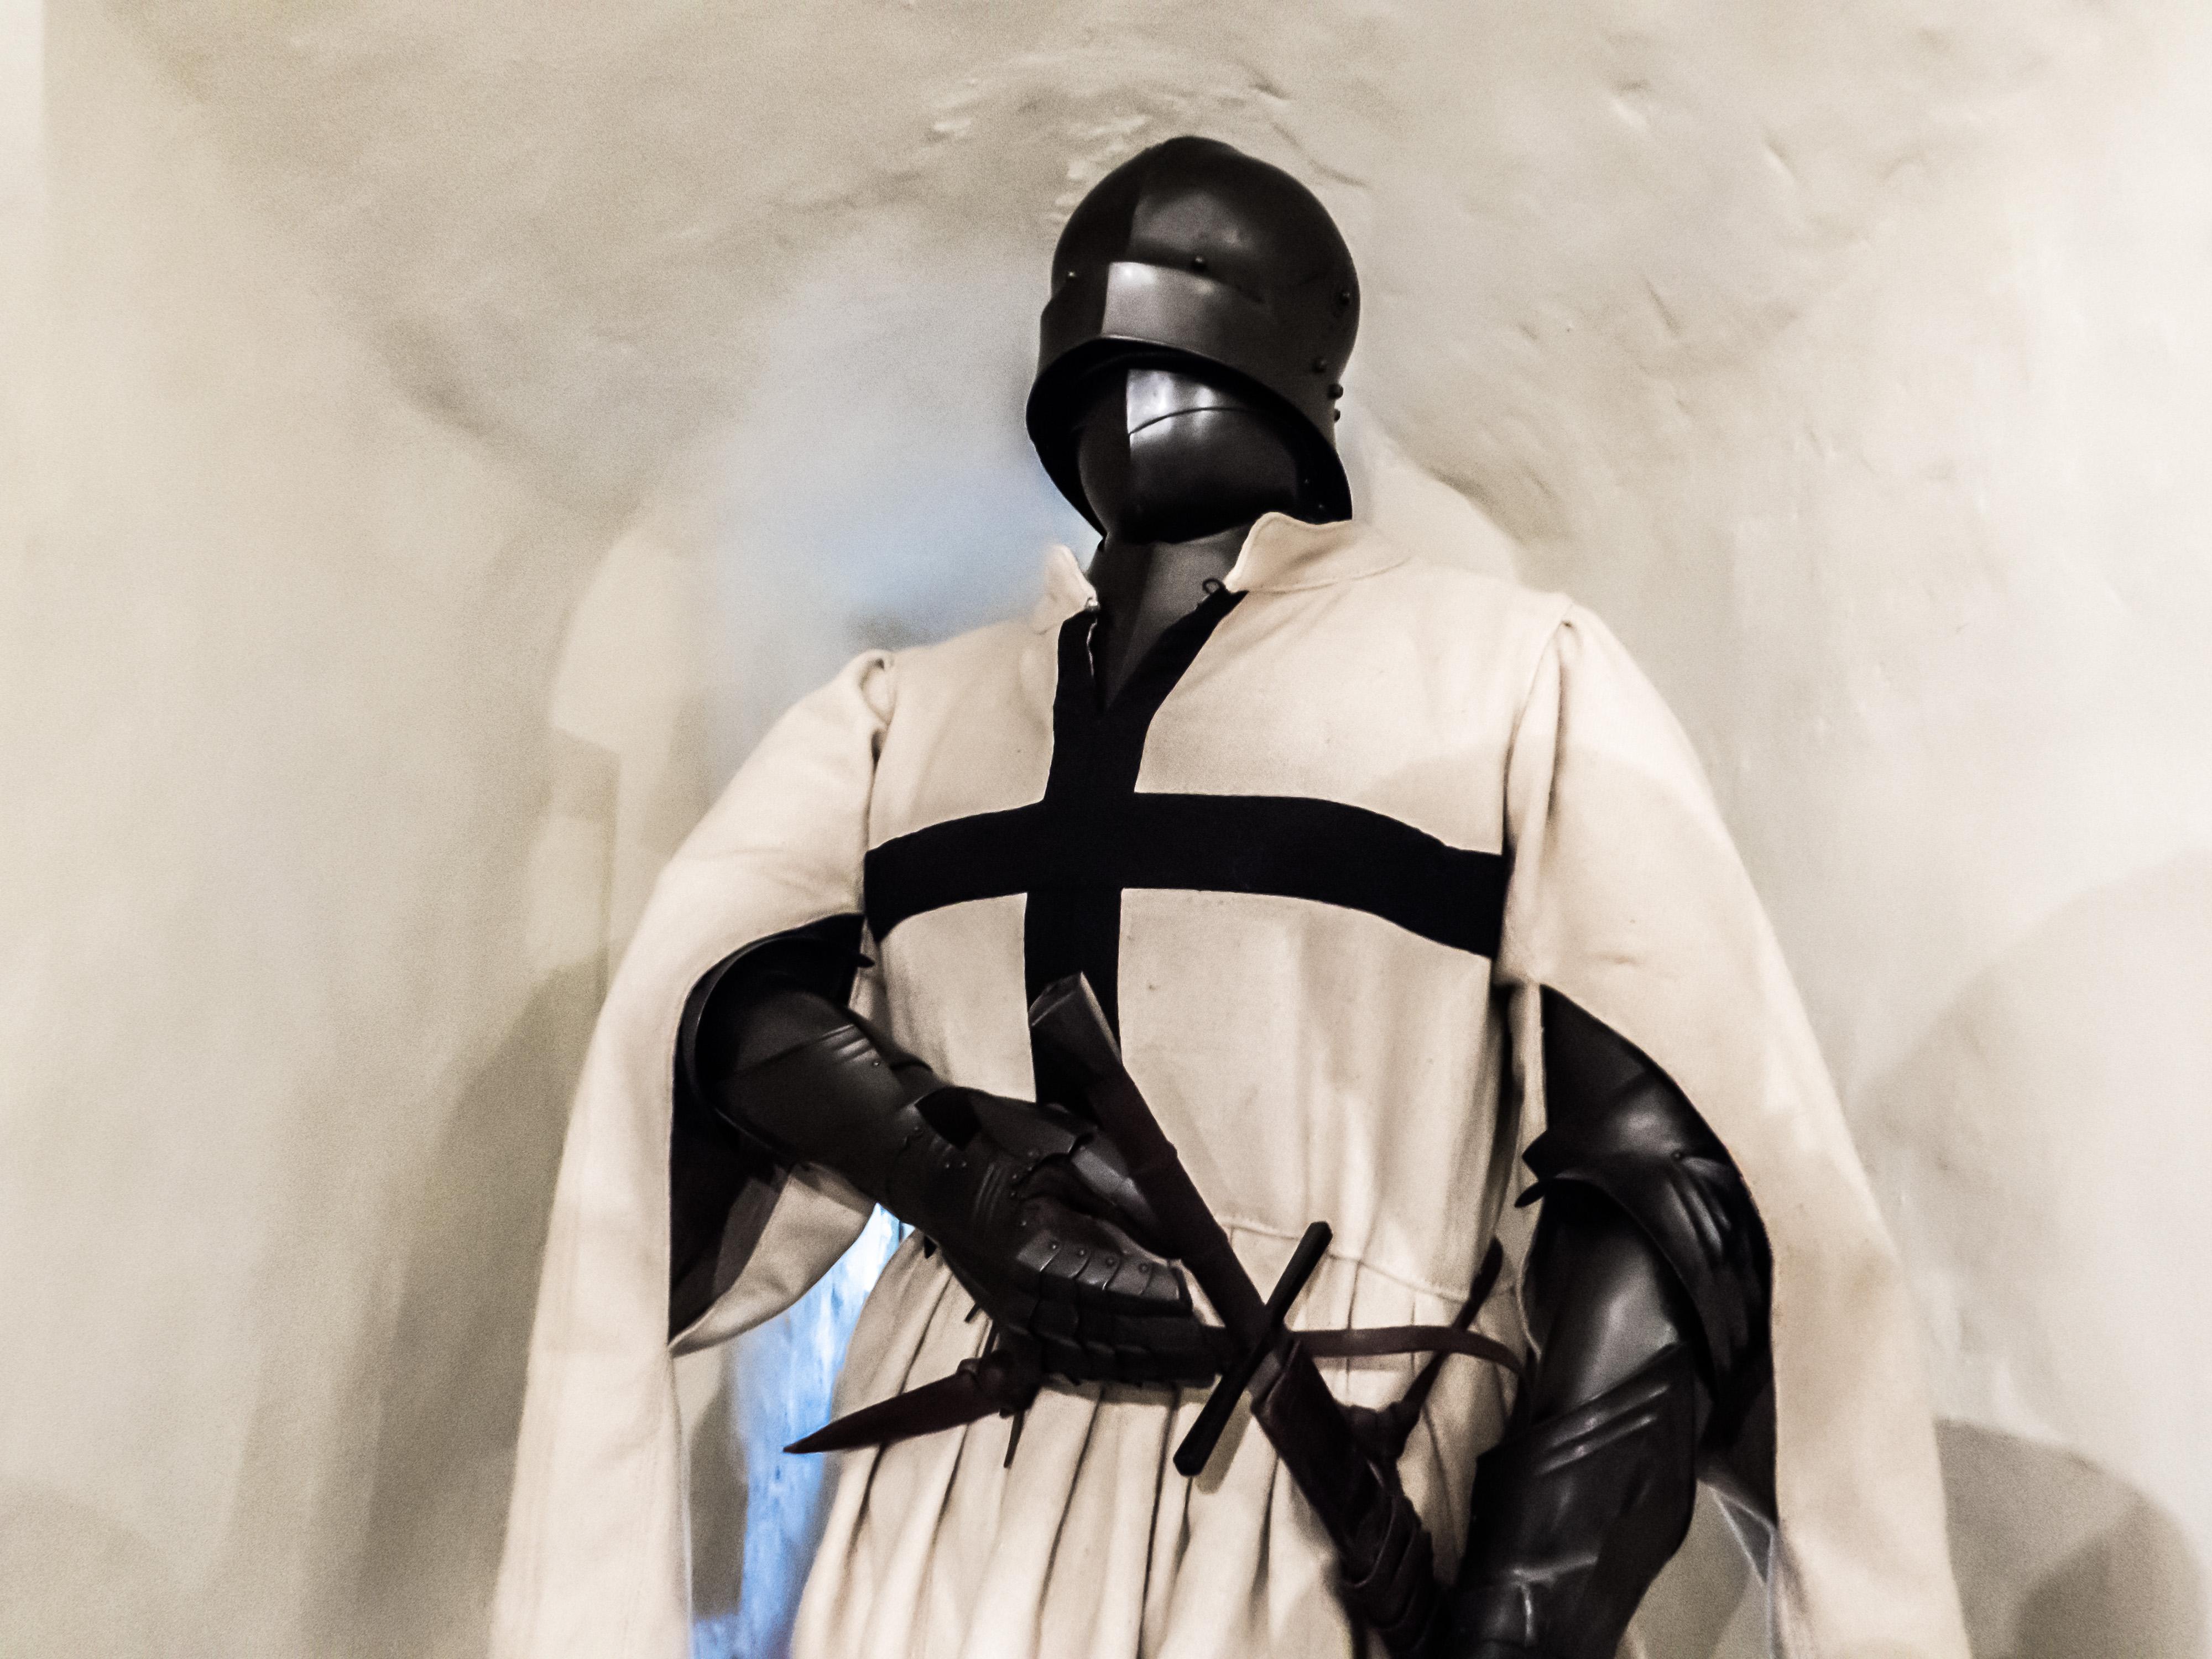 Crusader, Armor, History, War, Sword, HQ Photo